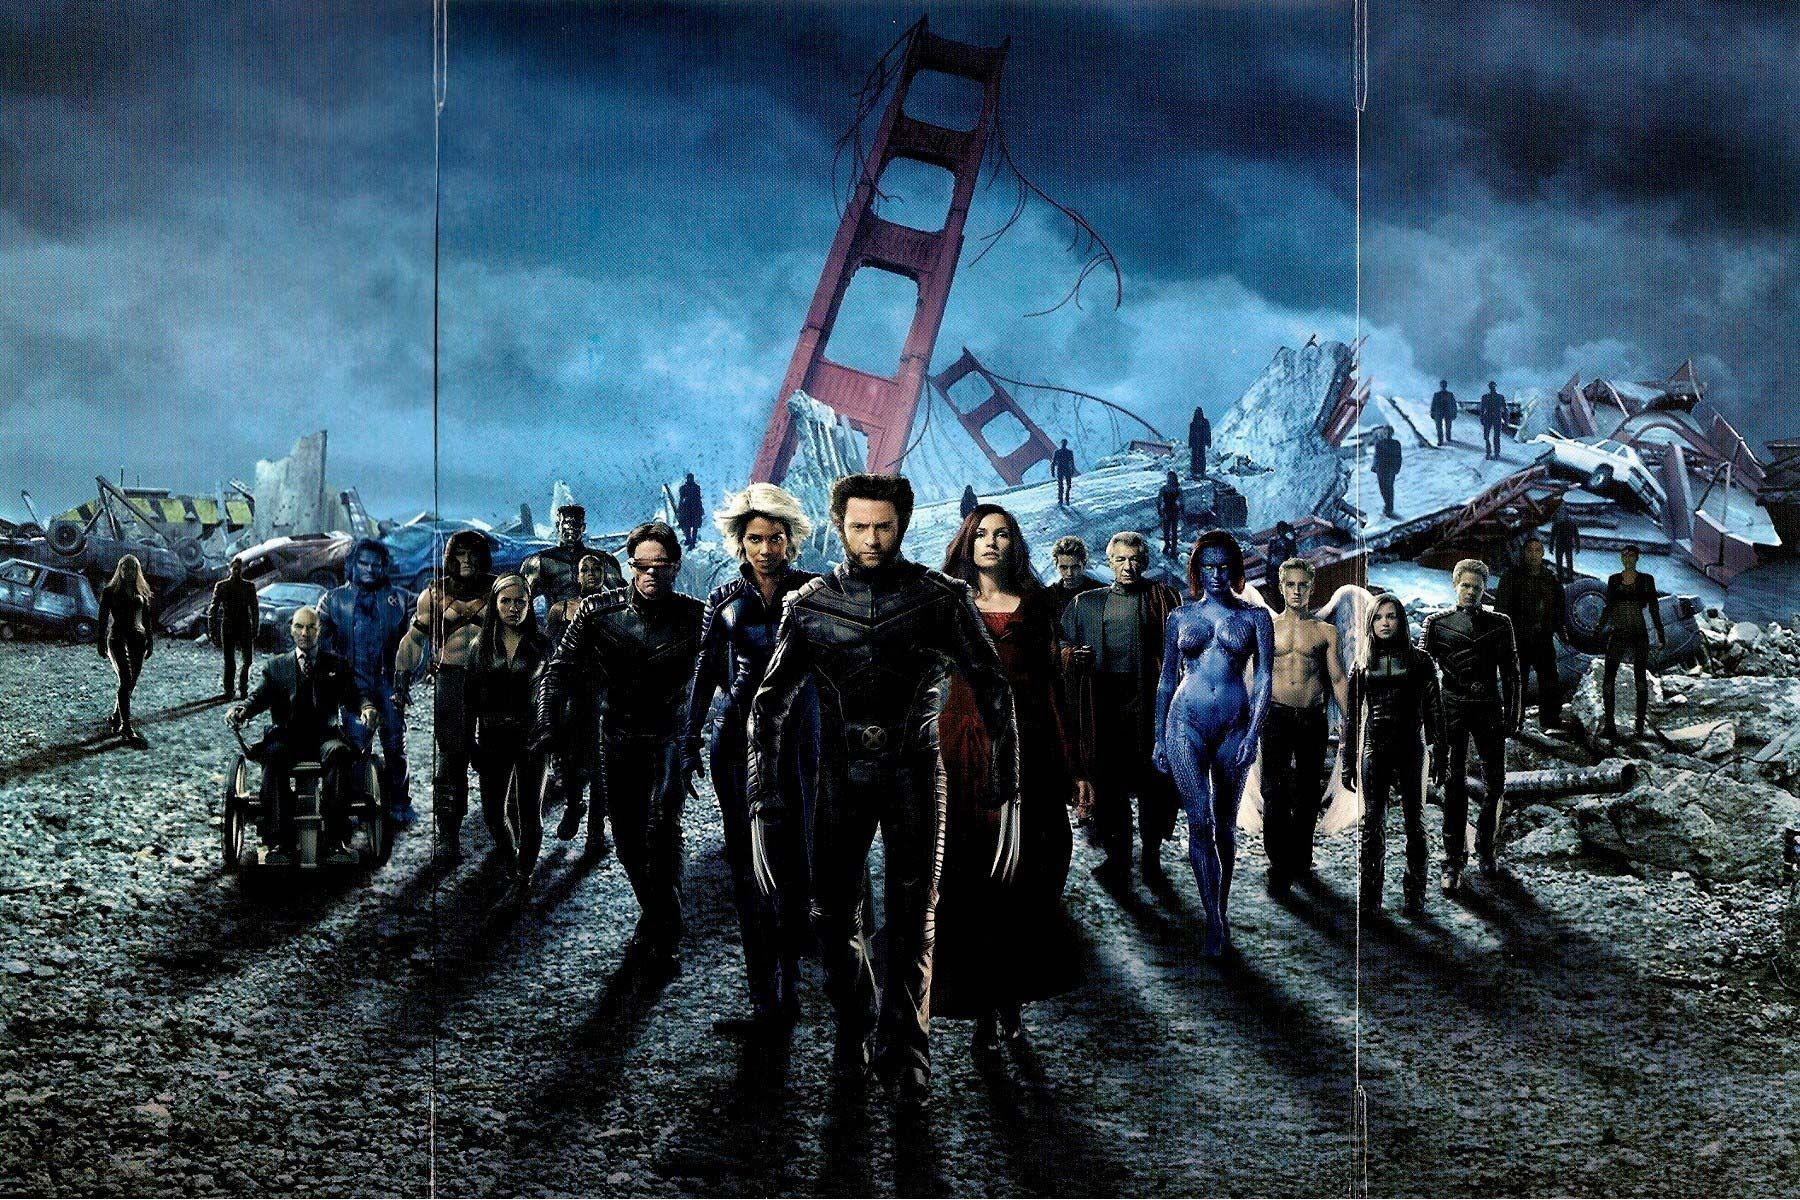 Hugh Jackman Wolverine Wallpapers Amp Desktop Backgrounds X Men Man Movies Movies